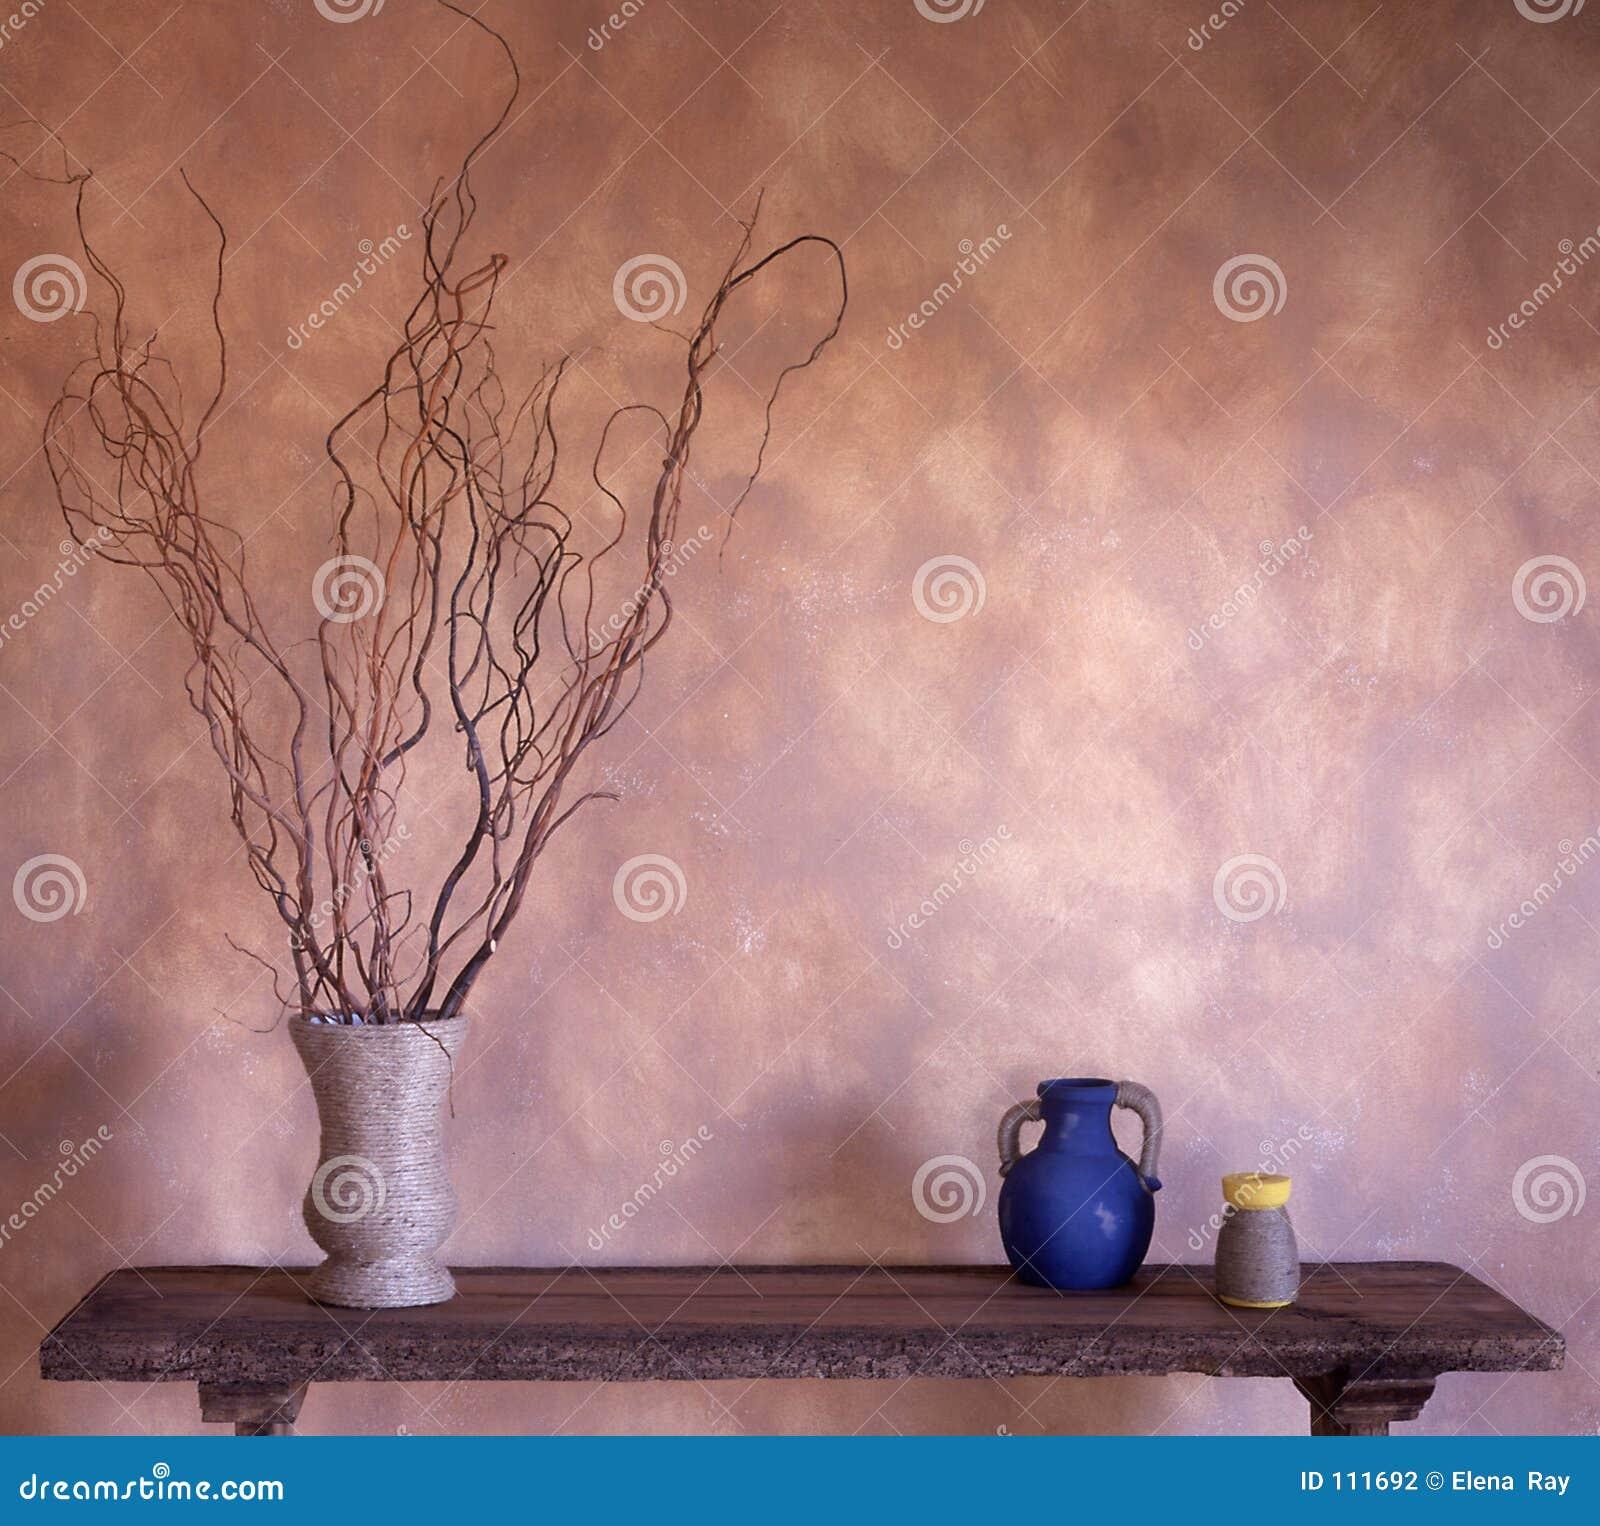 Artful Interior